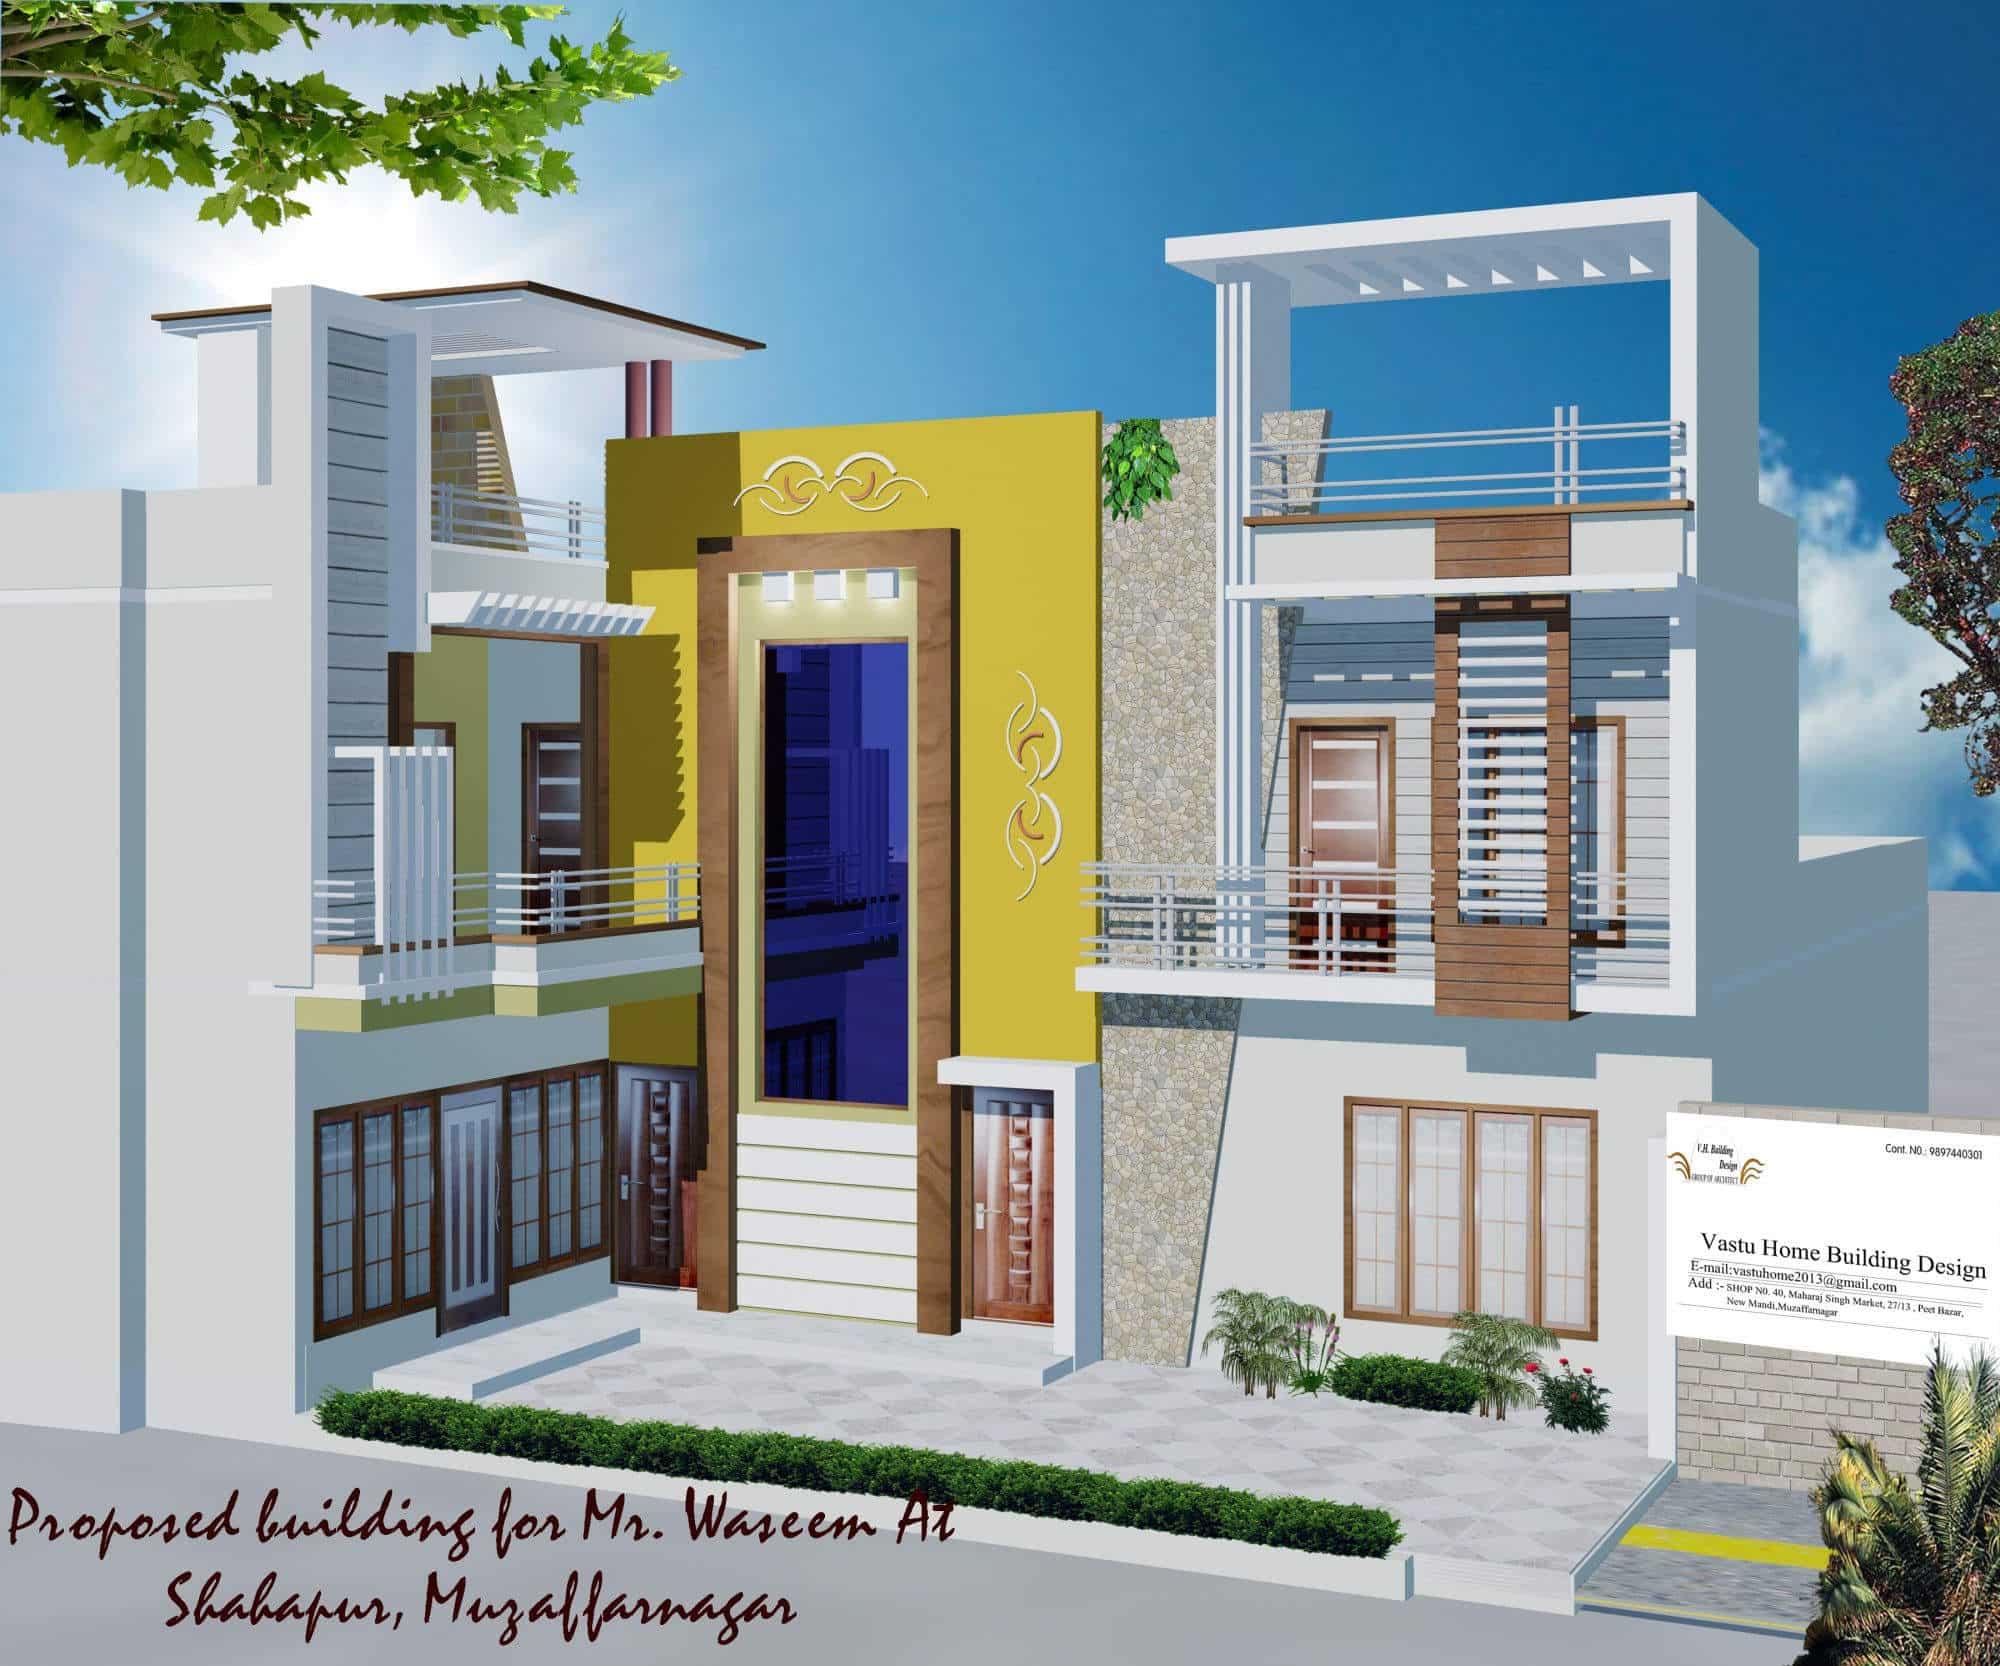 Vastu home building design muzaffar nagar city architects in muzaffarnagar justdial